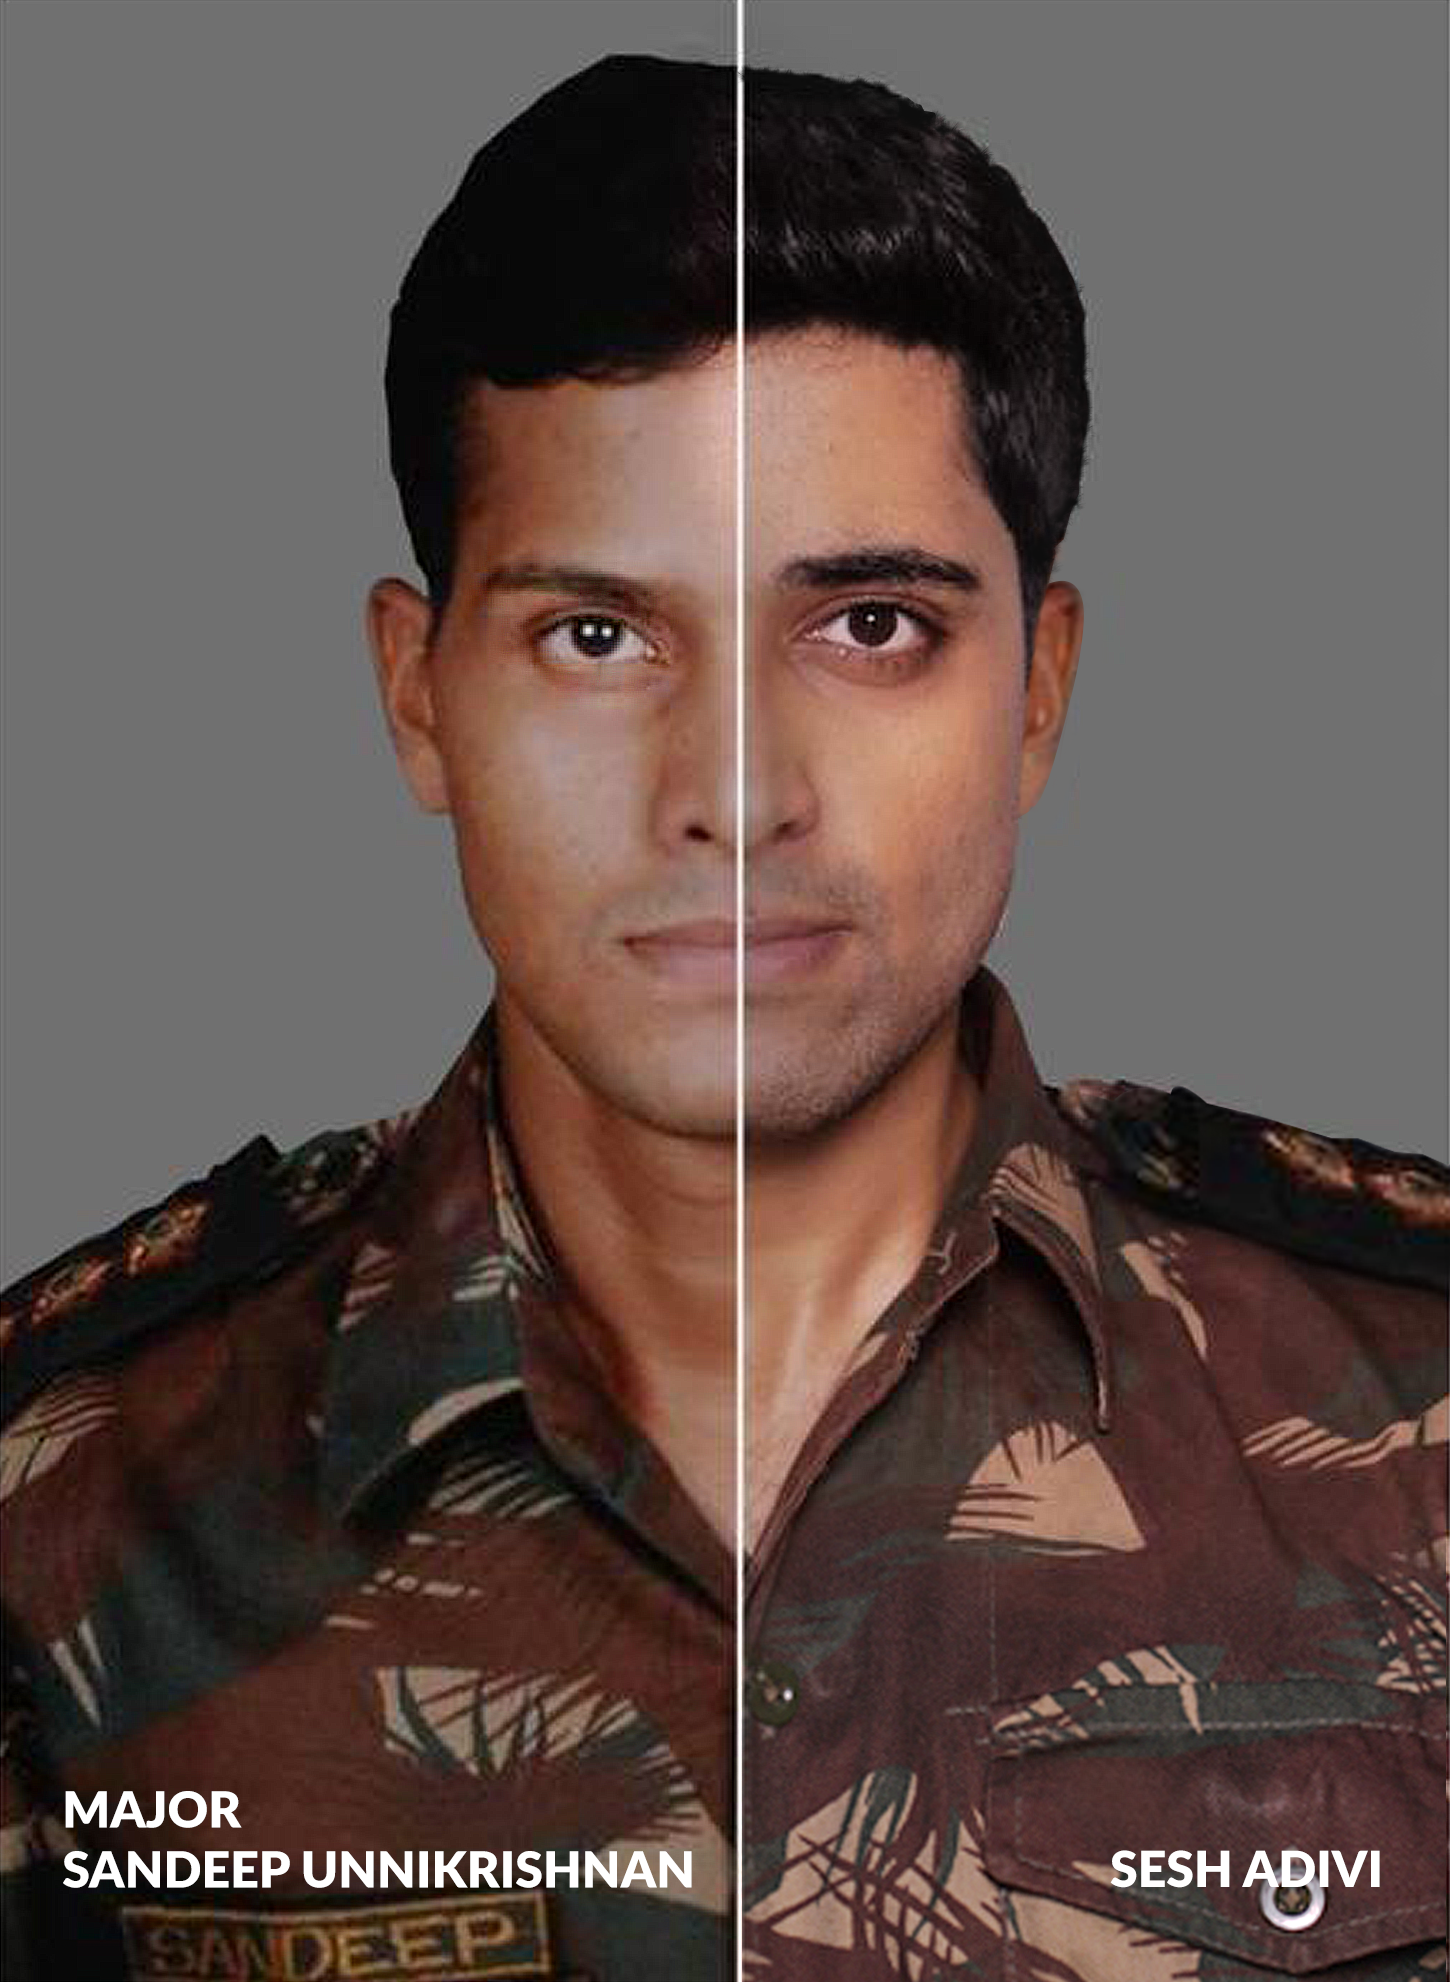 Actor Adivi Sesh Reveals Look Test As Major Sandeep Unnikrishnan